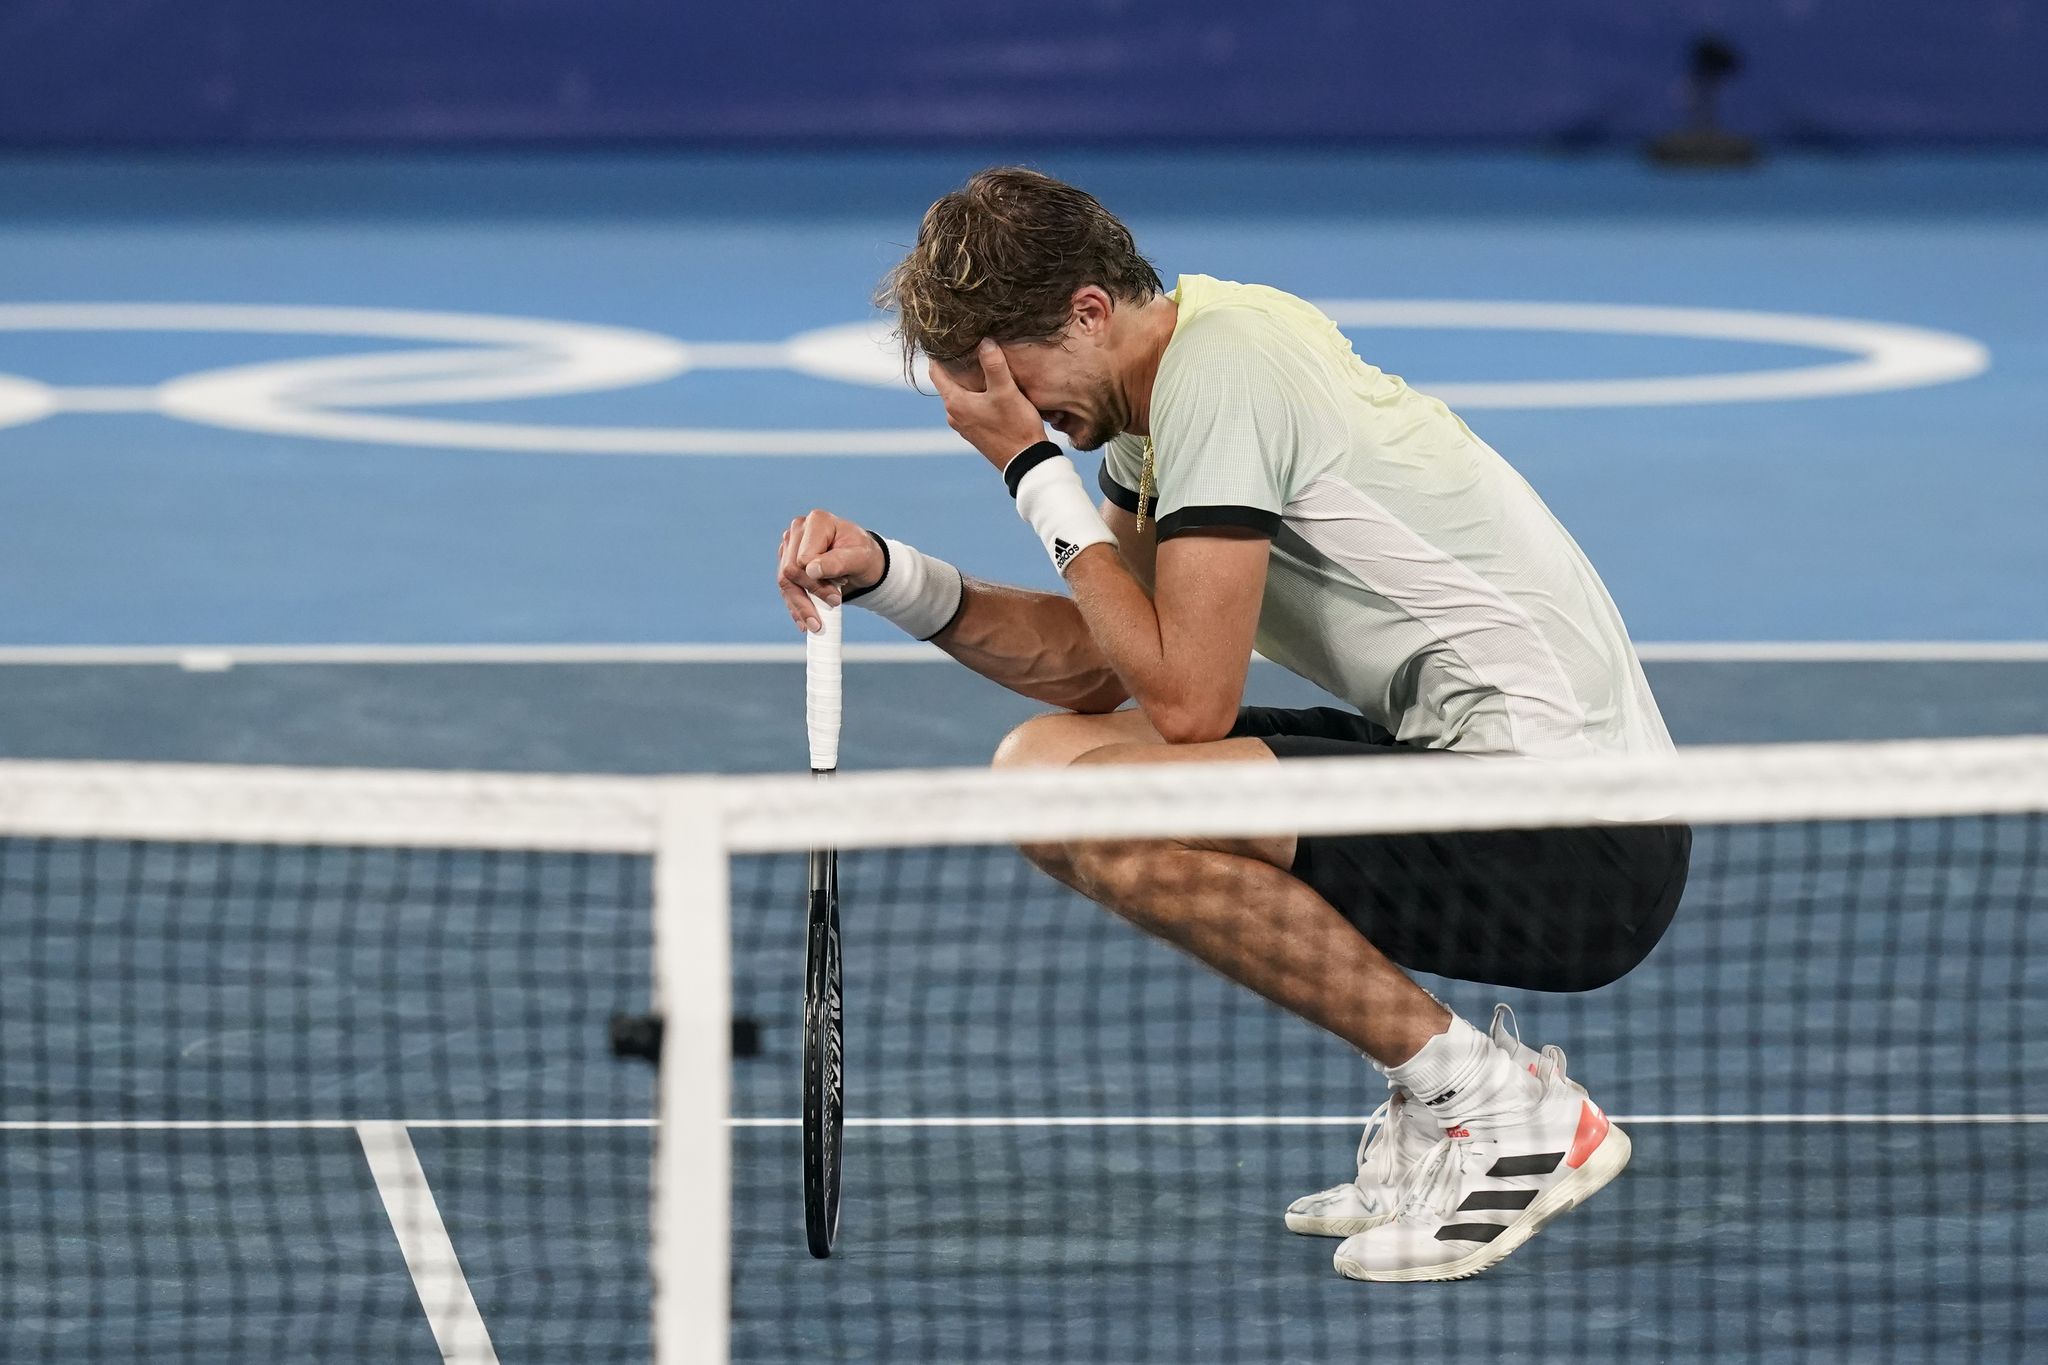 Germany's Alexander Zverev reacts after defeating Serbia's Novak Djokovic.